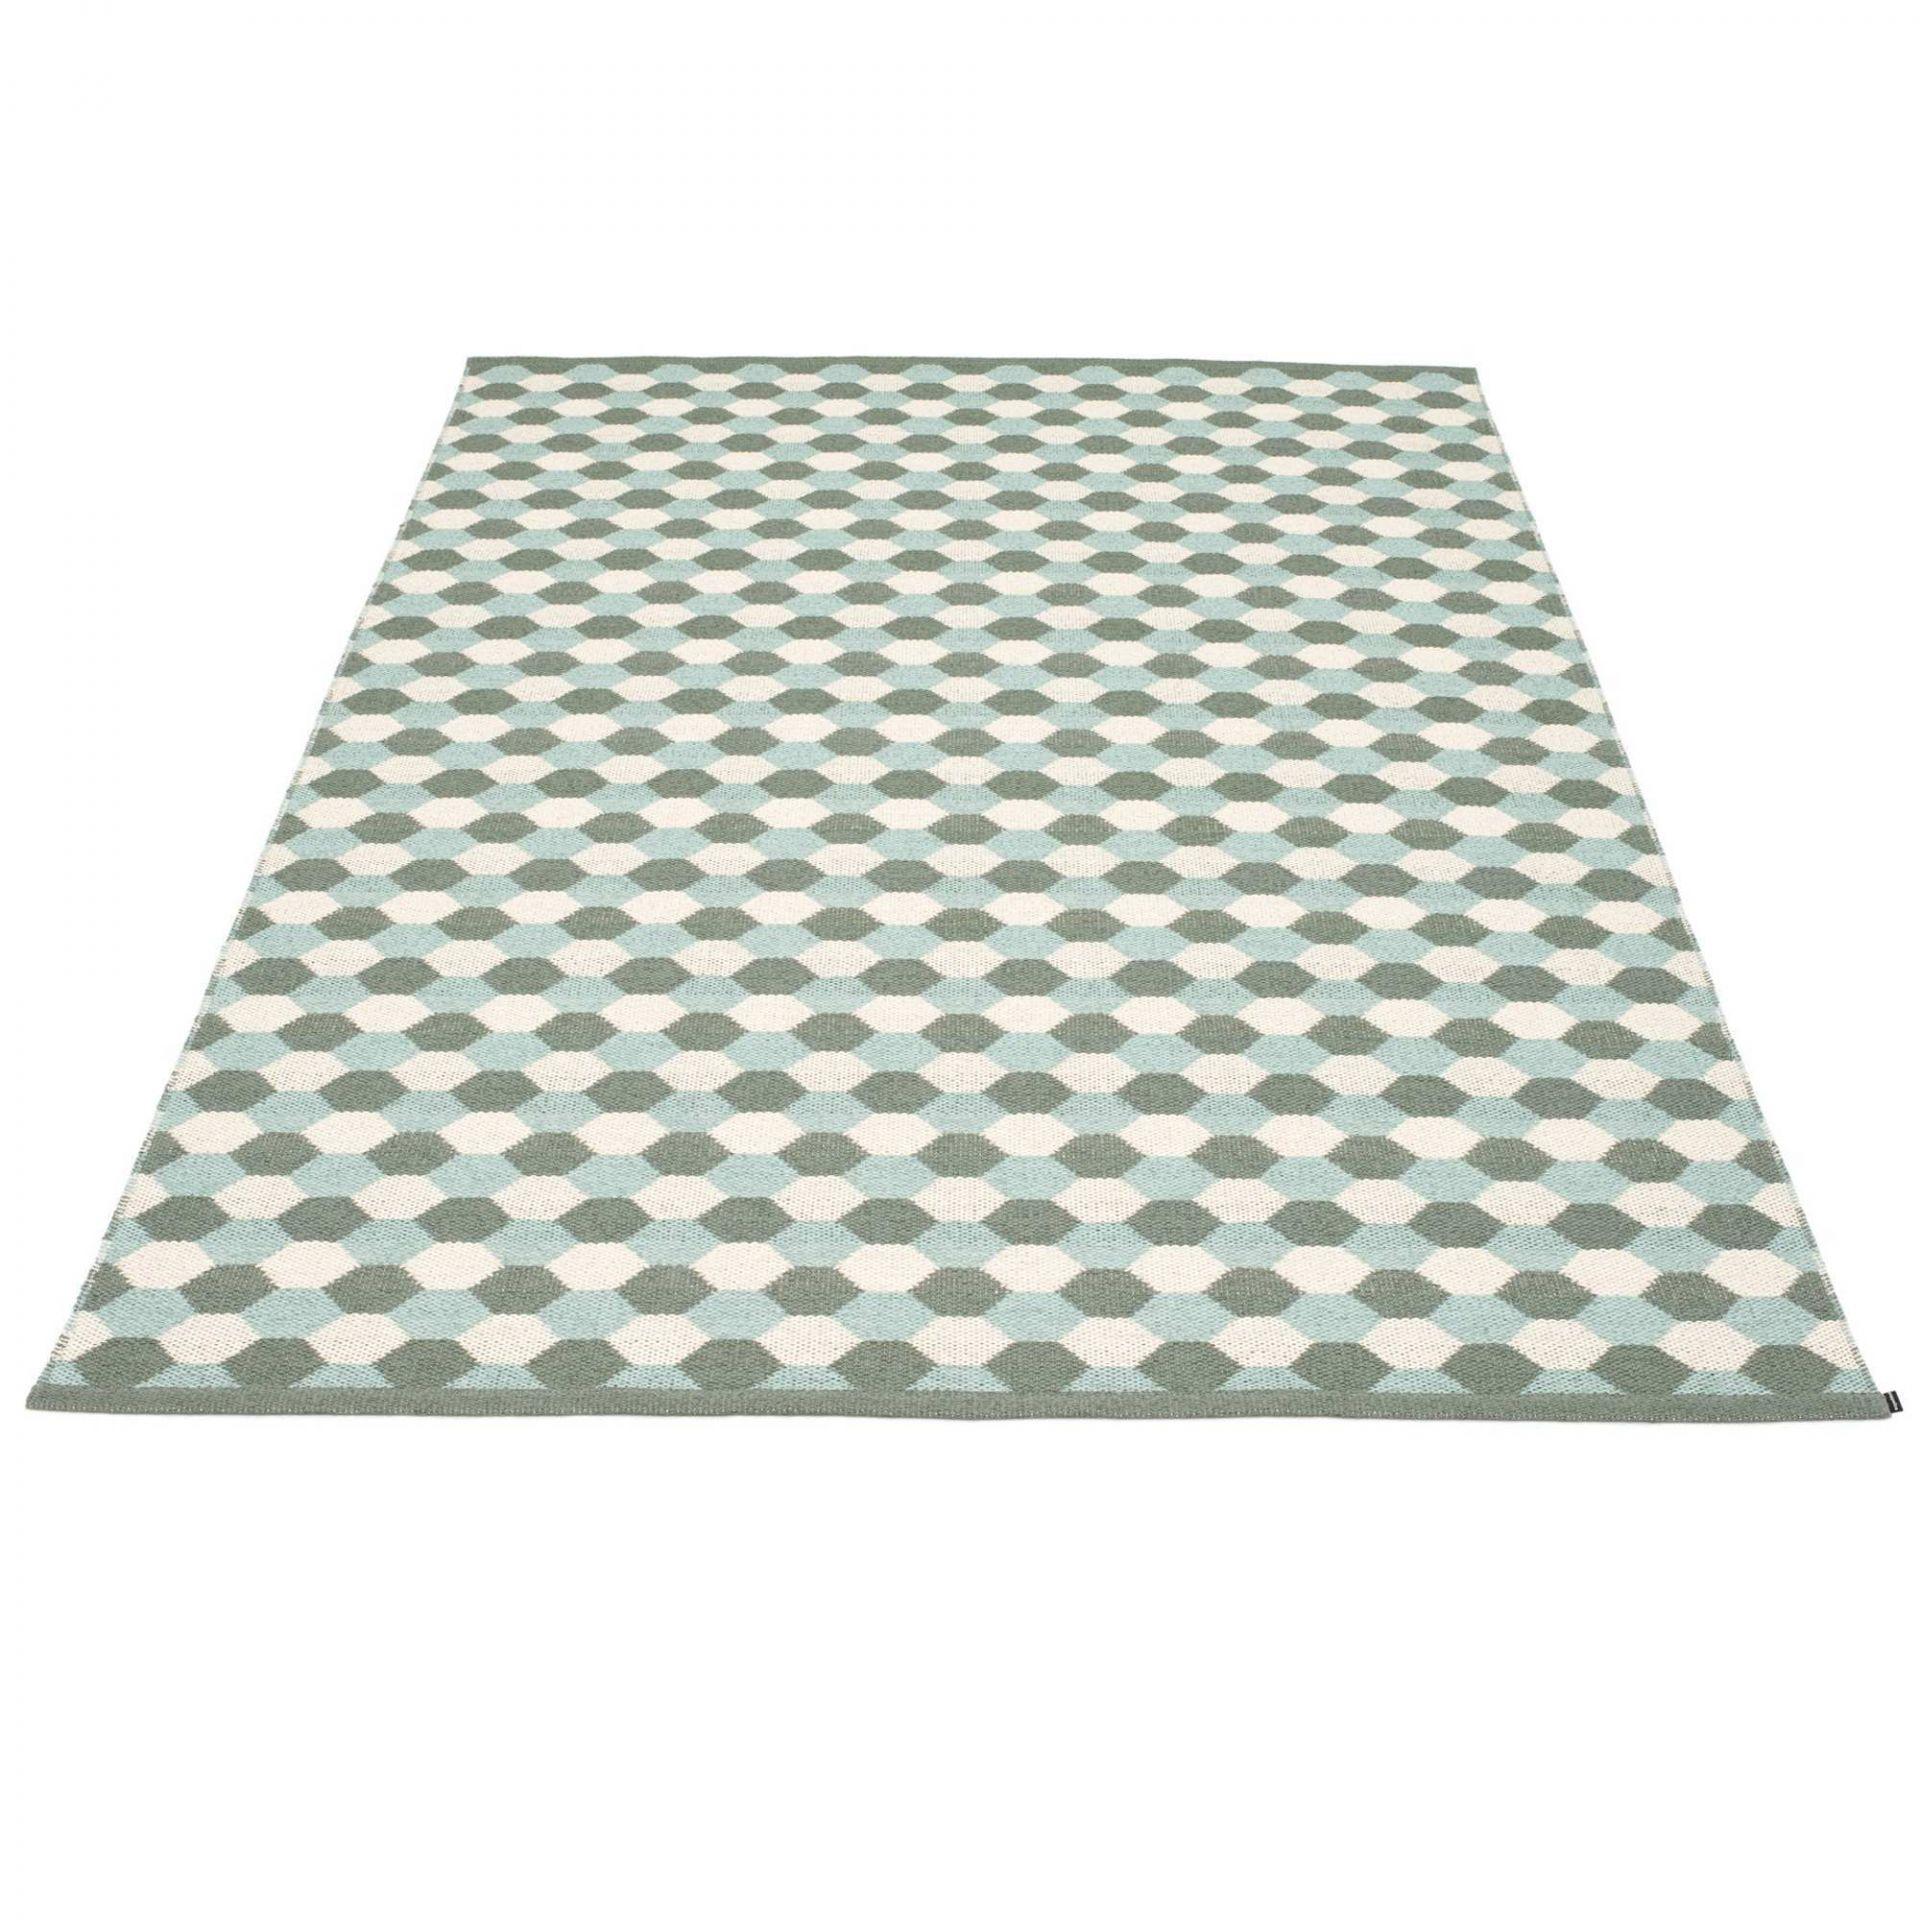 Dana Kunststoffteppich 180x275 ocker Pappelina